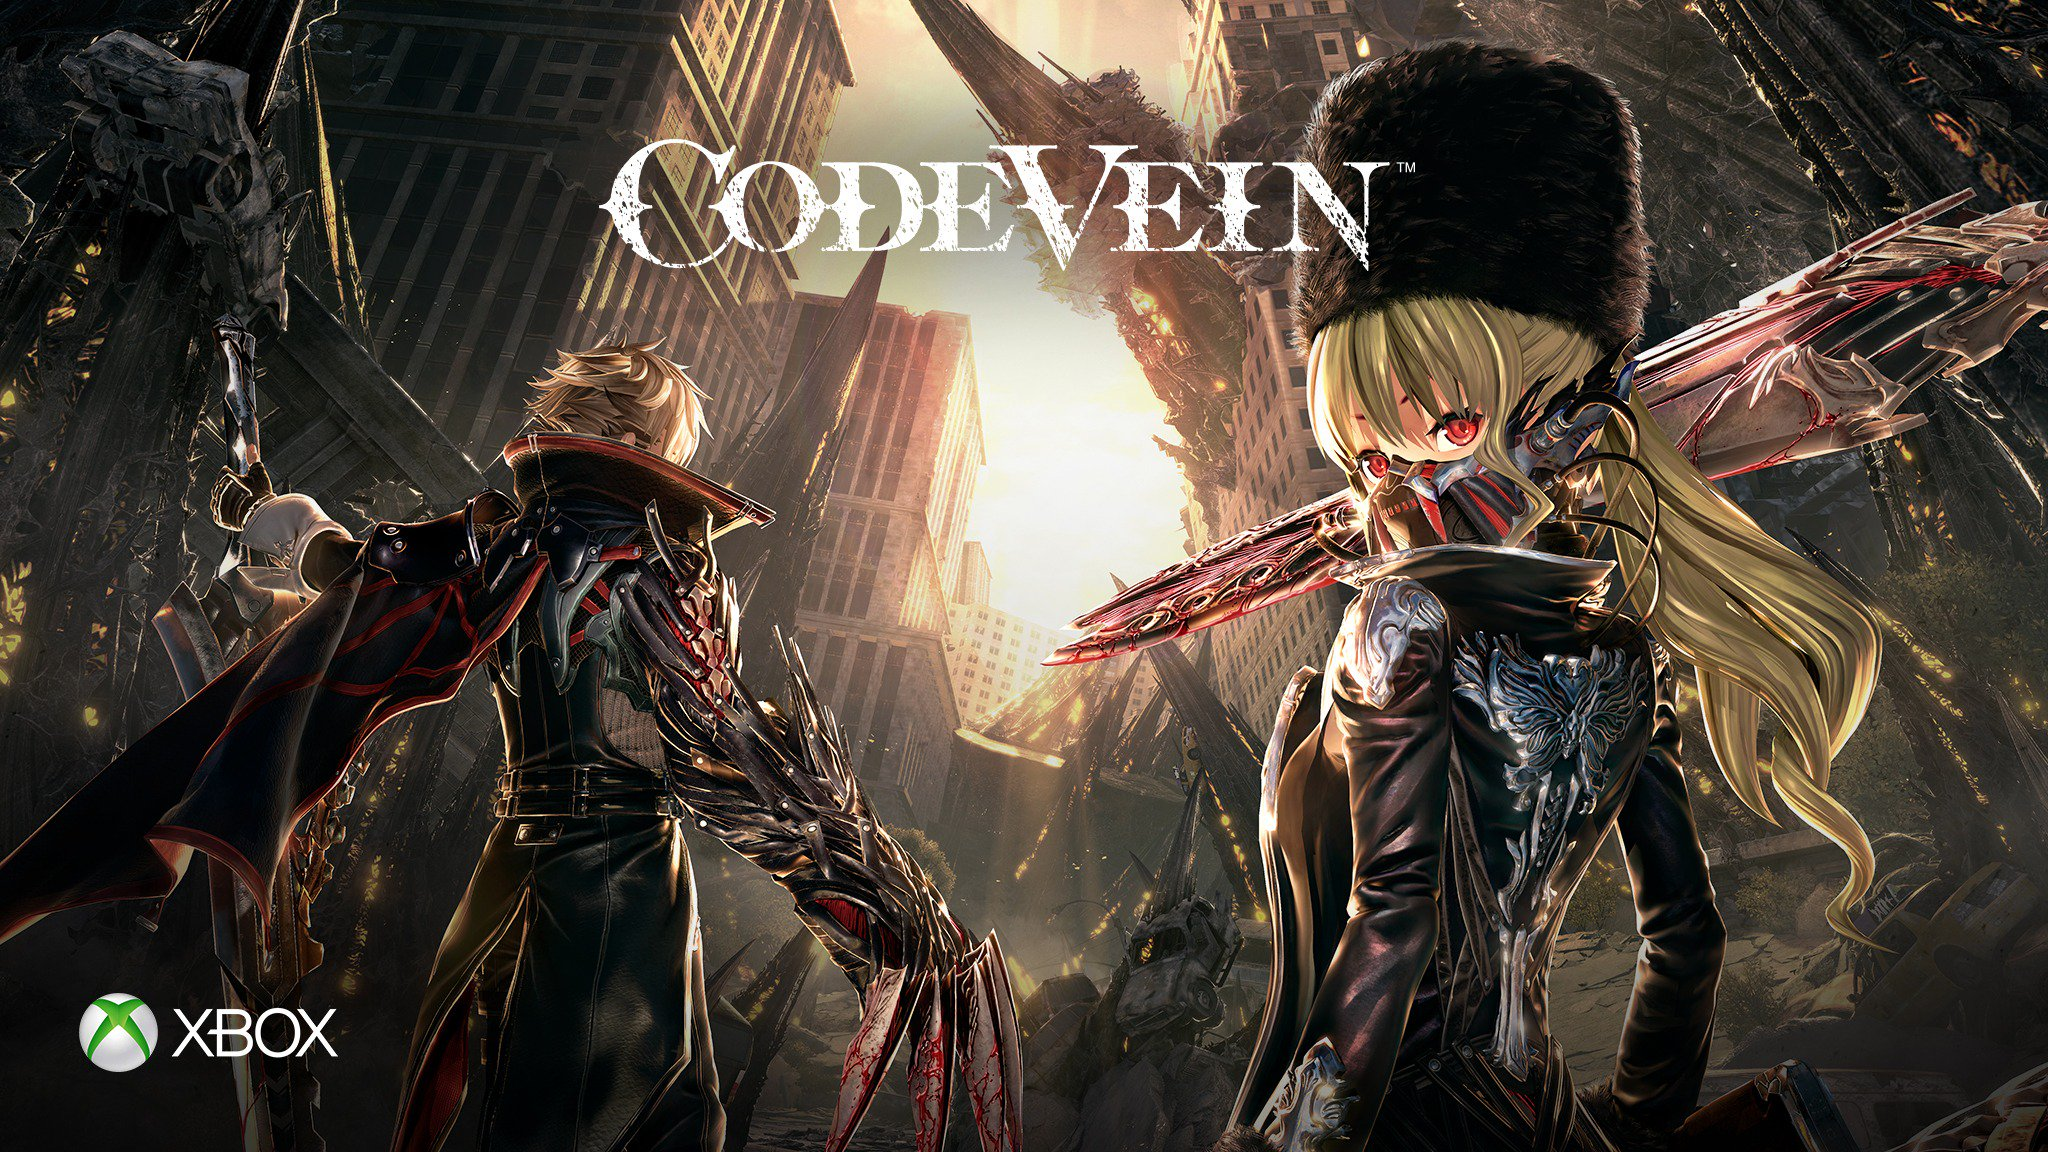 code vein artwork 001